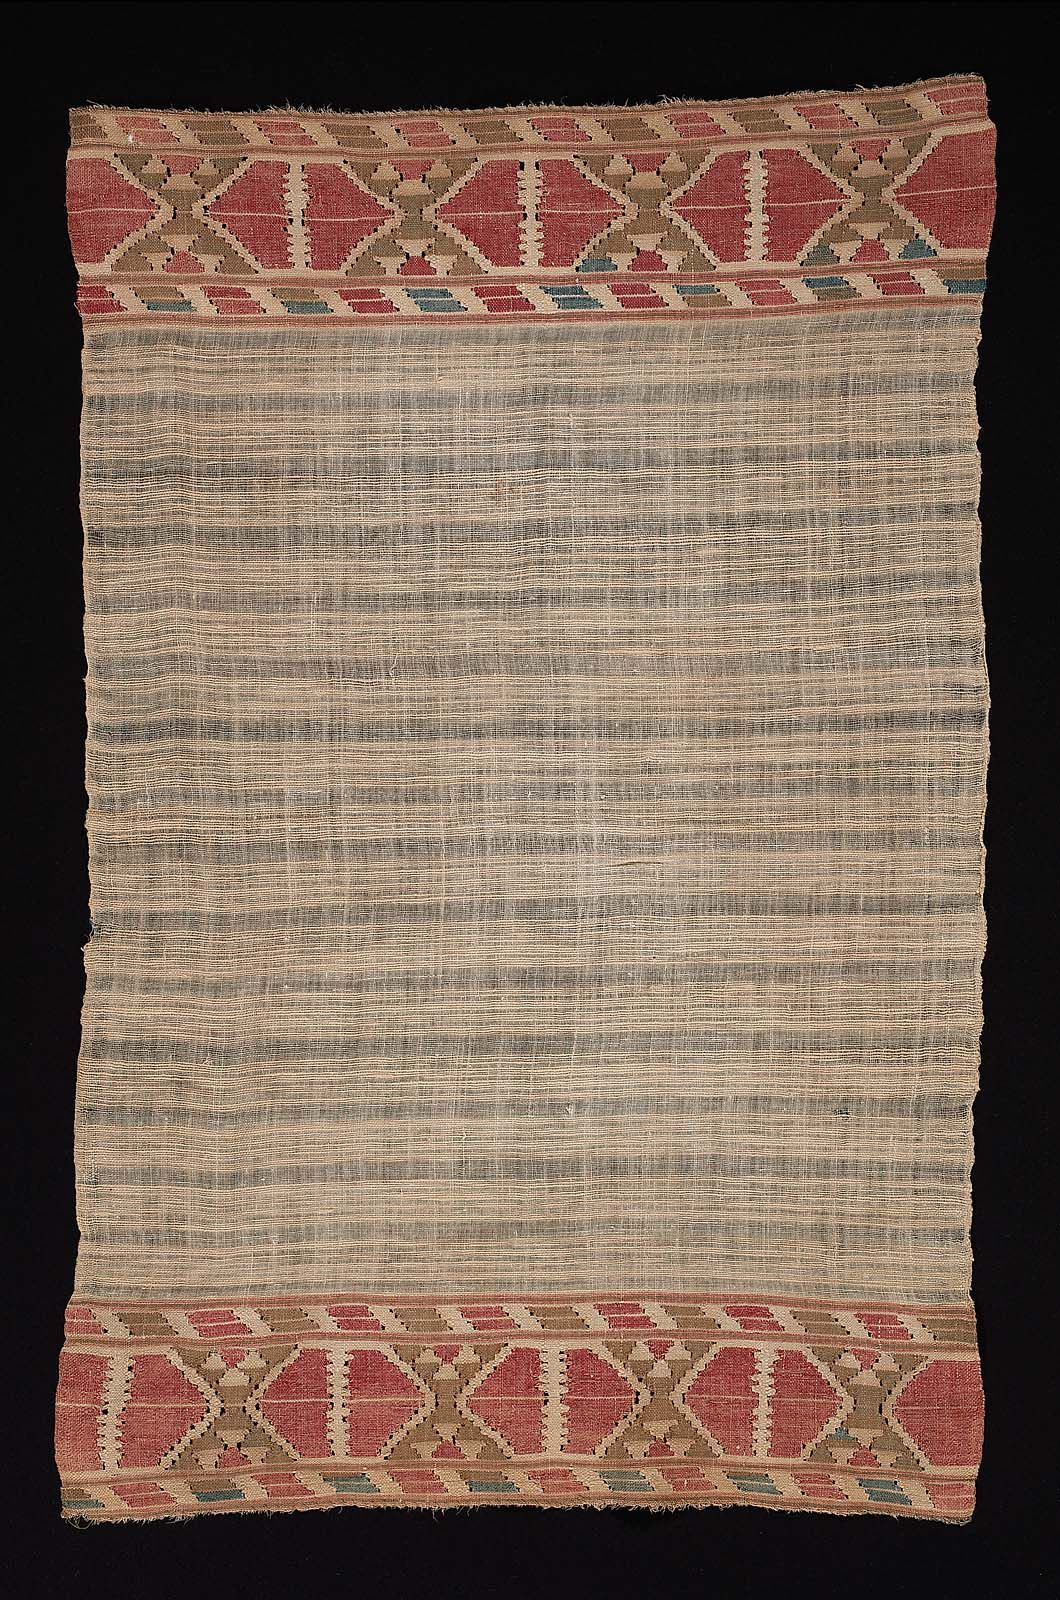 Tapestry Greek 19th century | Museum of Fine Arts, Boston